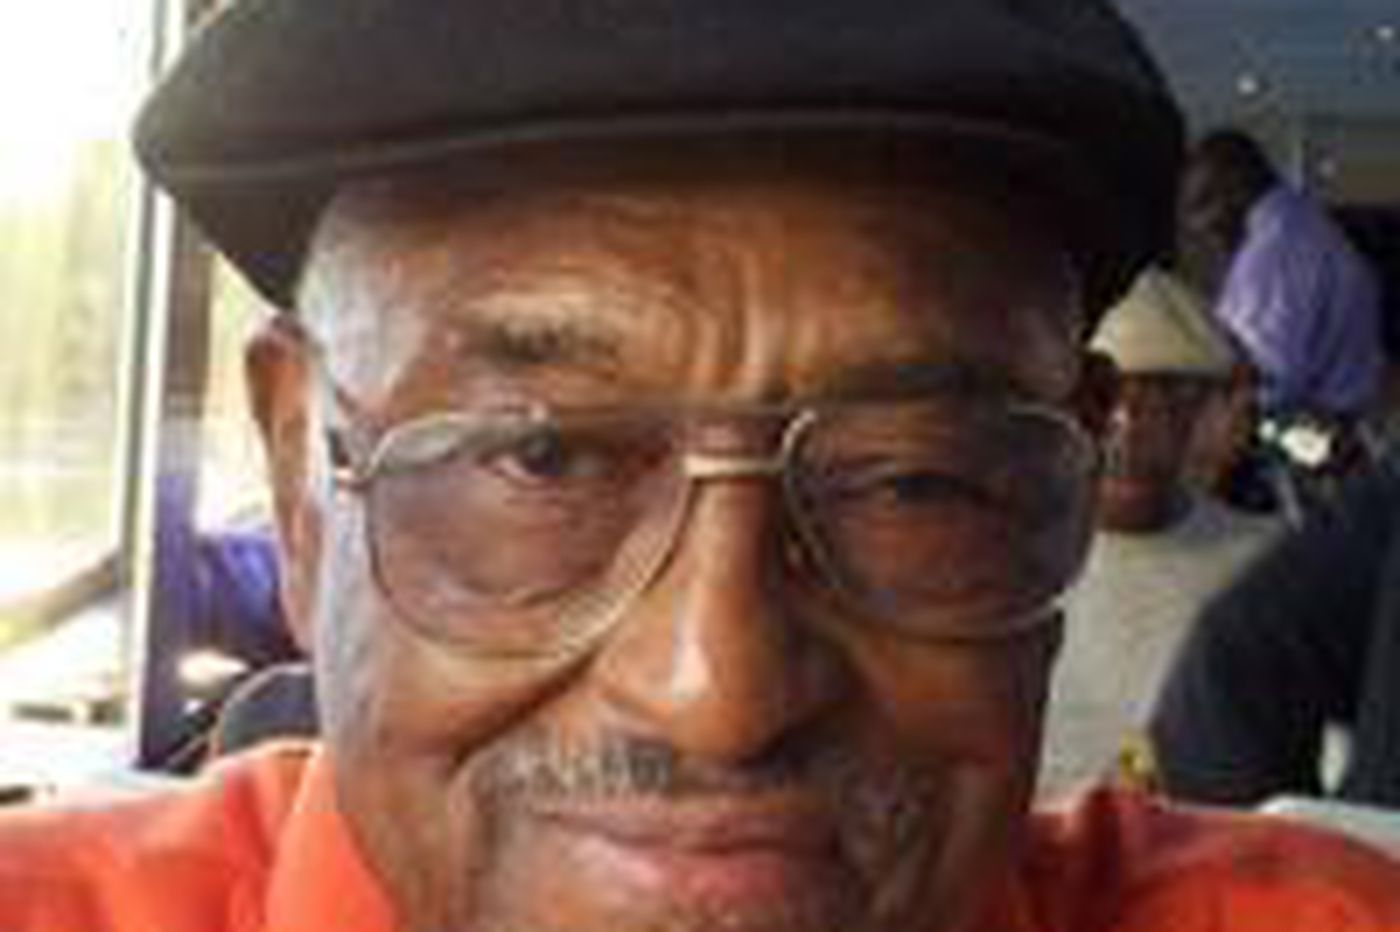 Arthur C. Rowland Sr., 84, former president of Laborers' Local 57